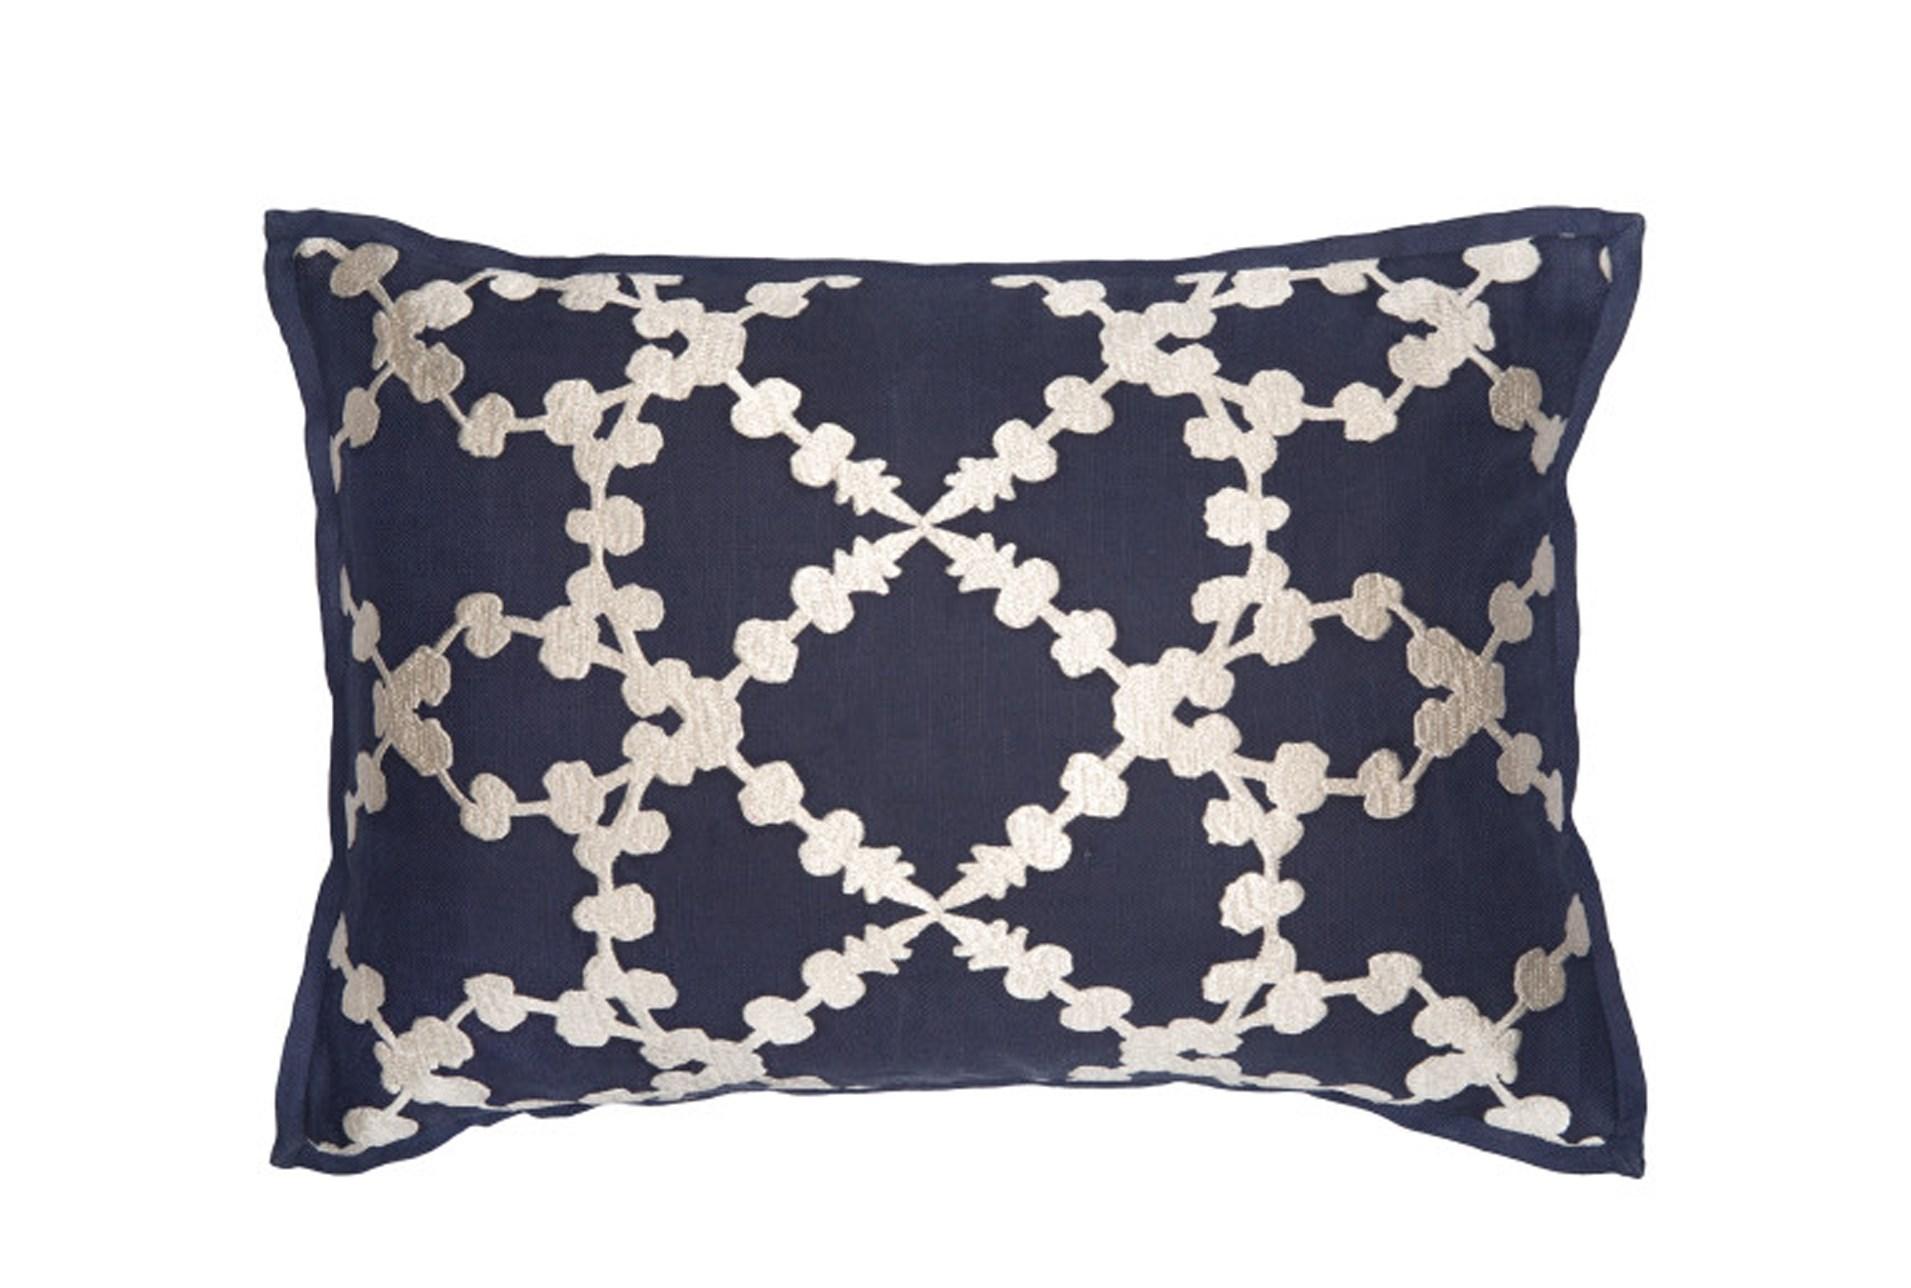 Decorative Pillows Living Spaces : Accent Pillow-Martha Lattice Indigo 14X20 Living Spaces